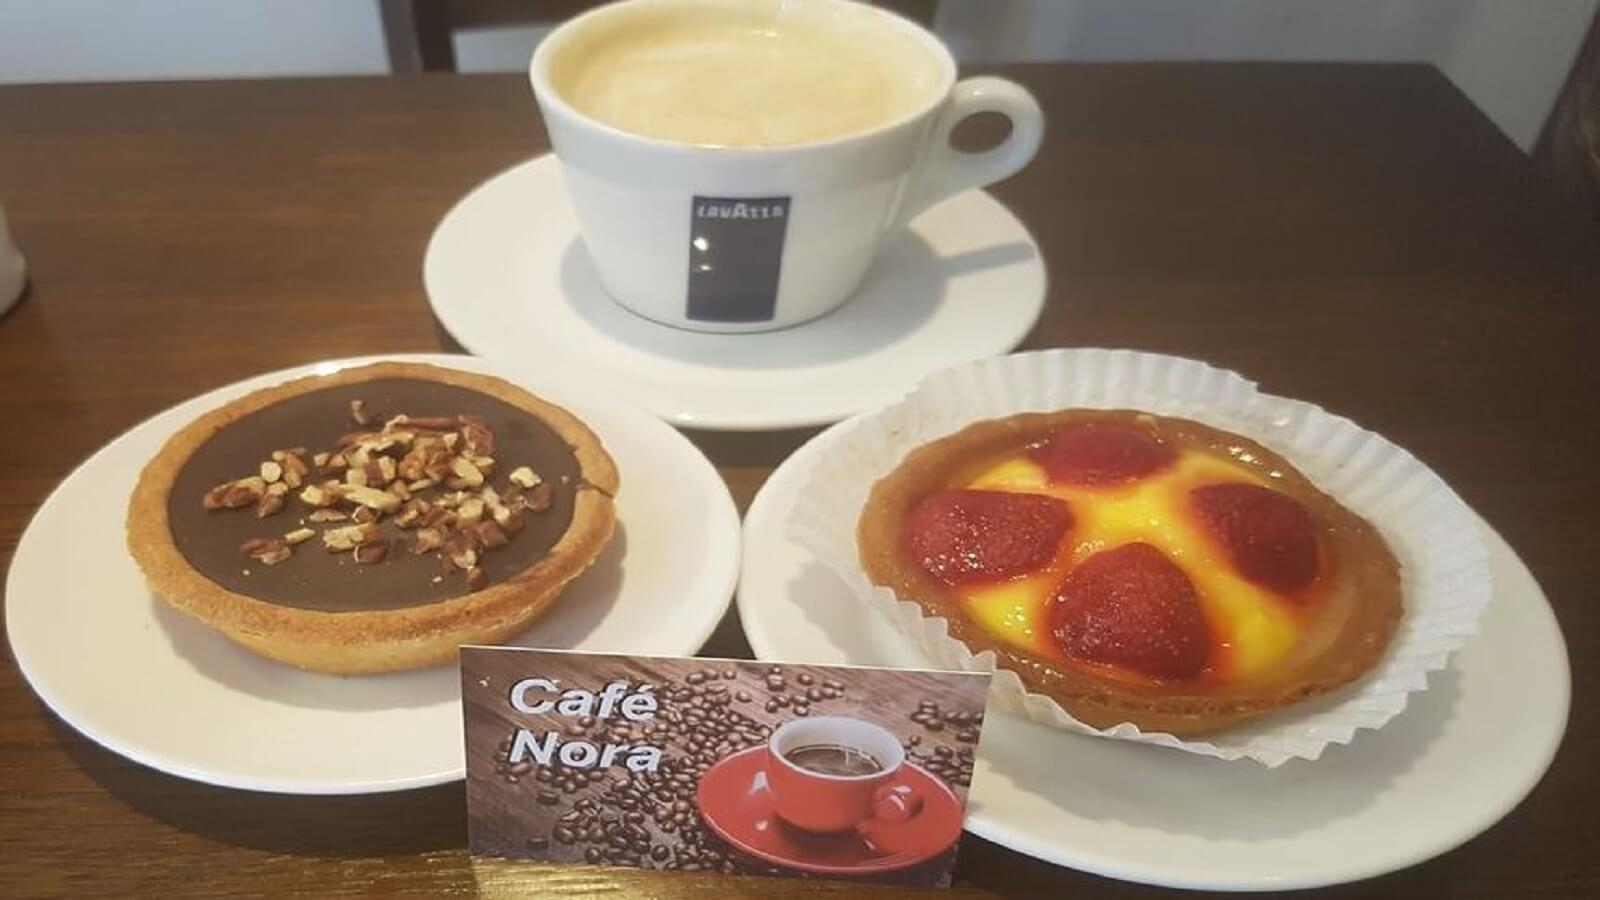 Cafe Nora